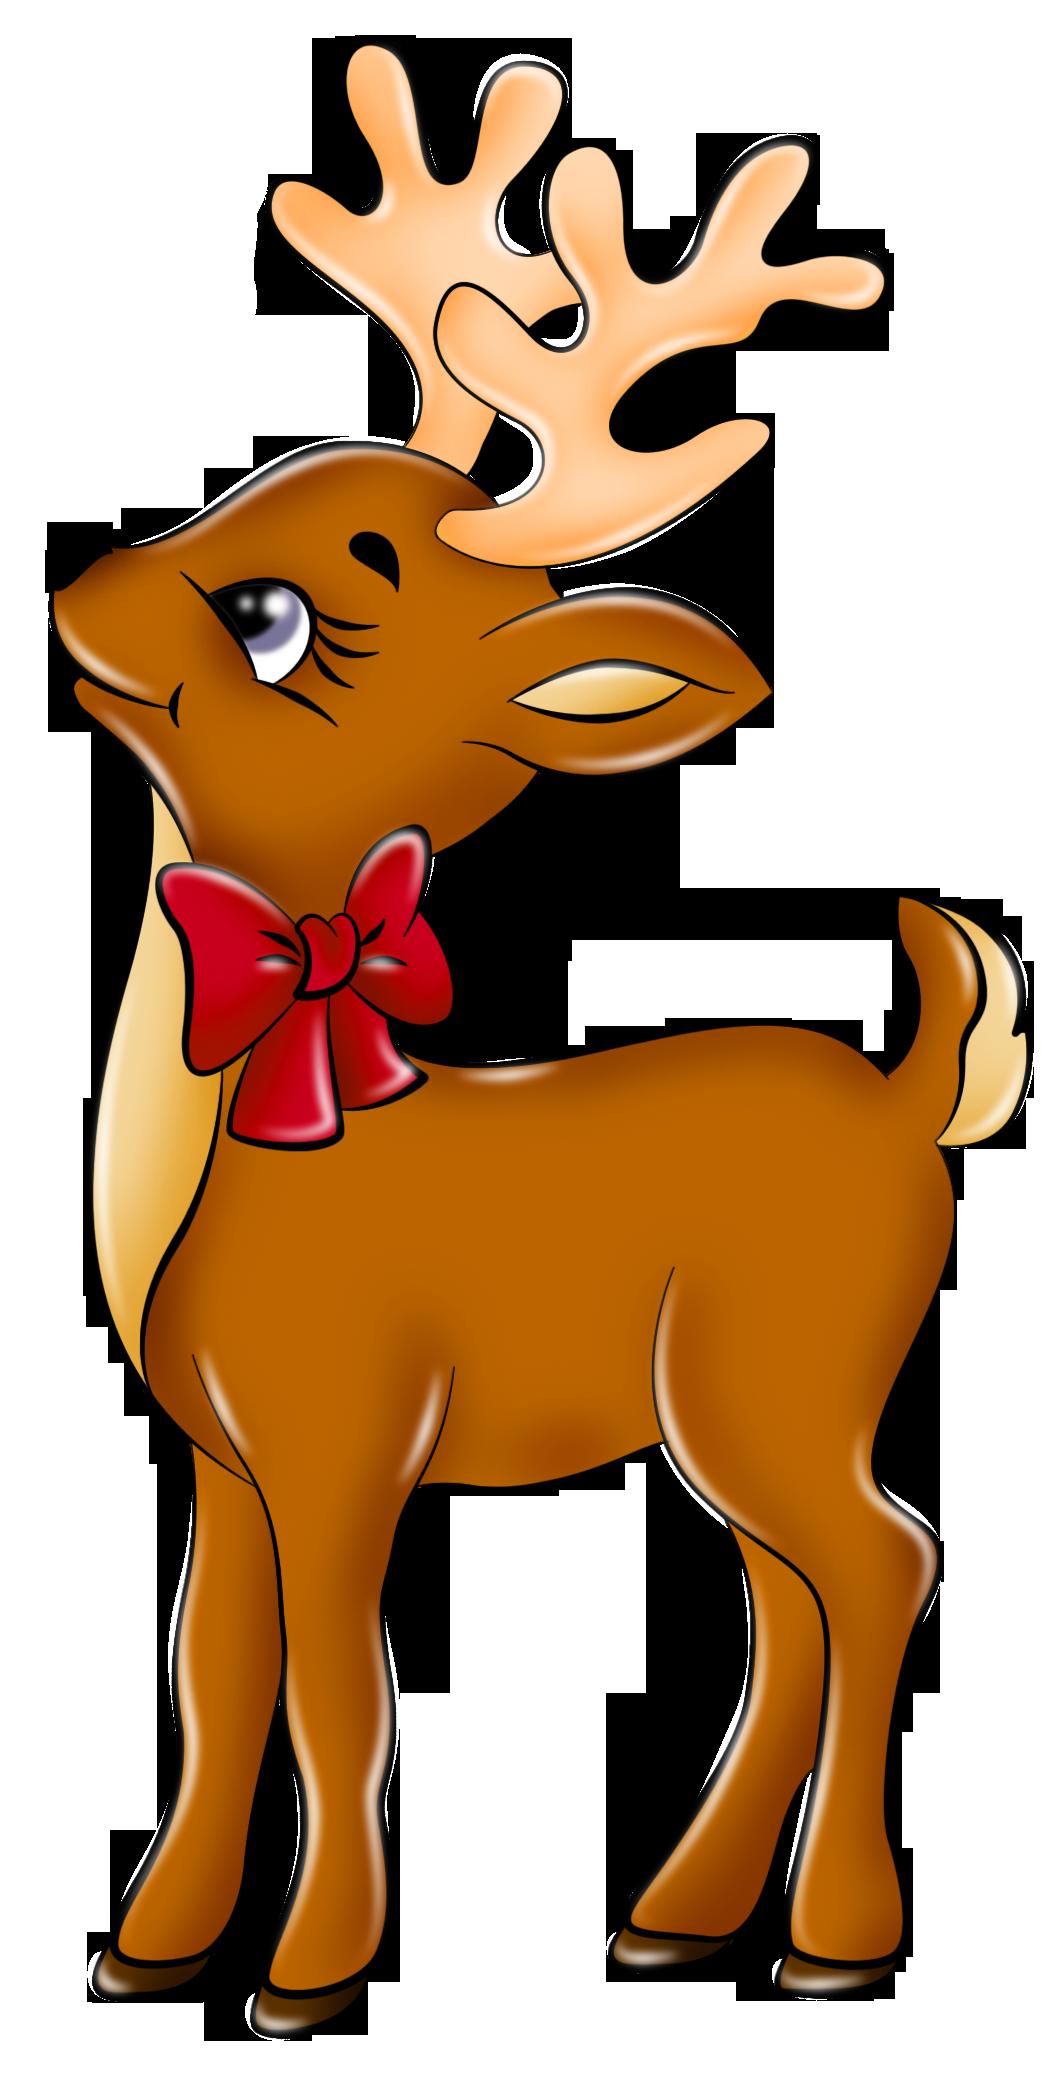 Reindeer Clip Art Free Image Free Clipar-Reindeer clip art free image free clipart image 4-7